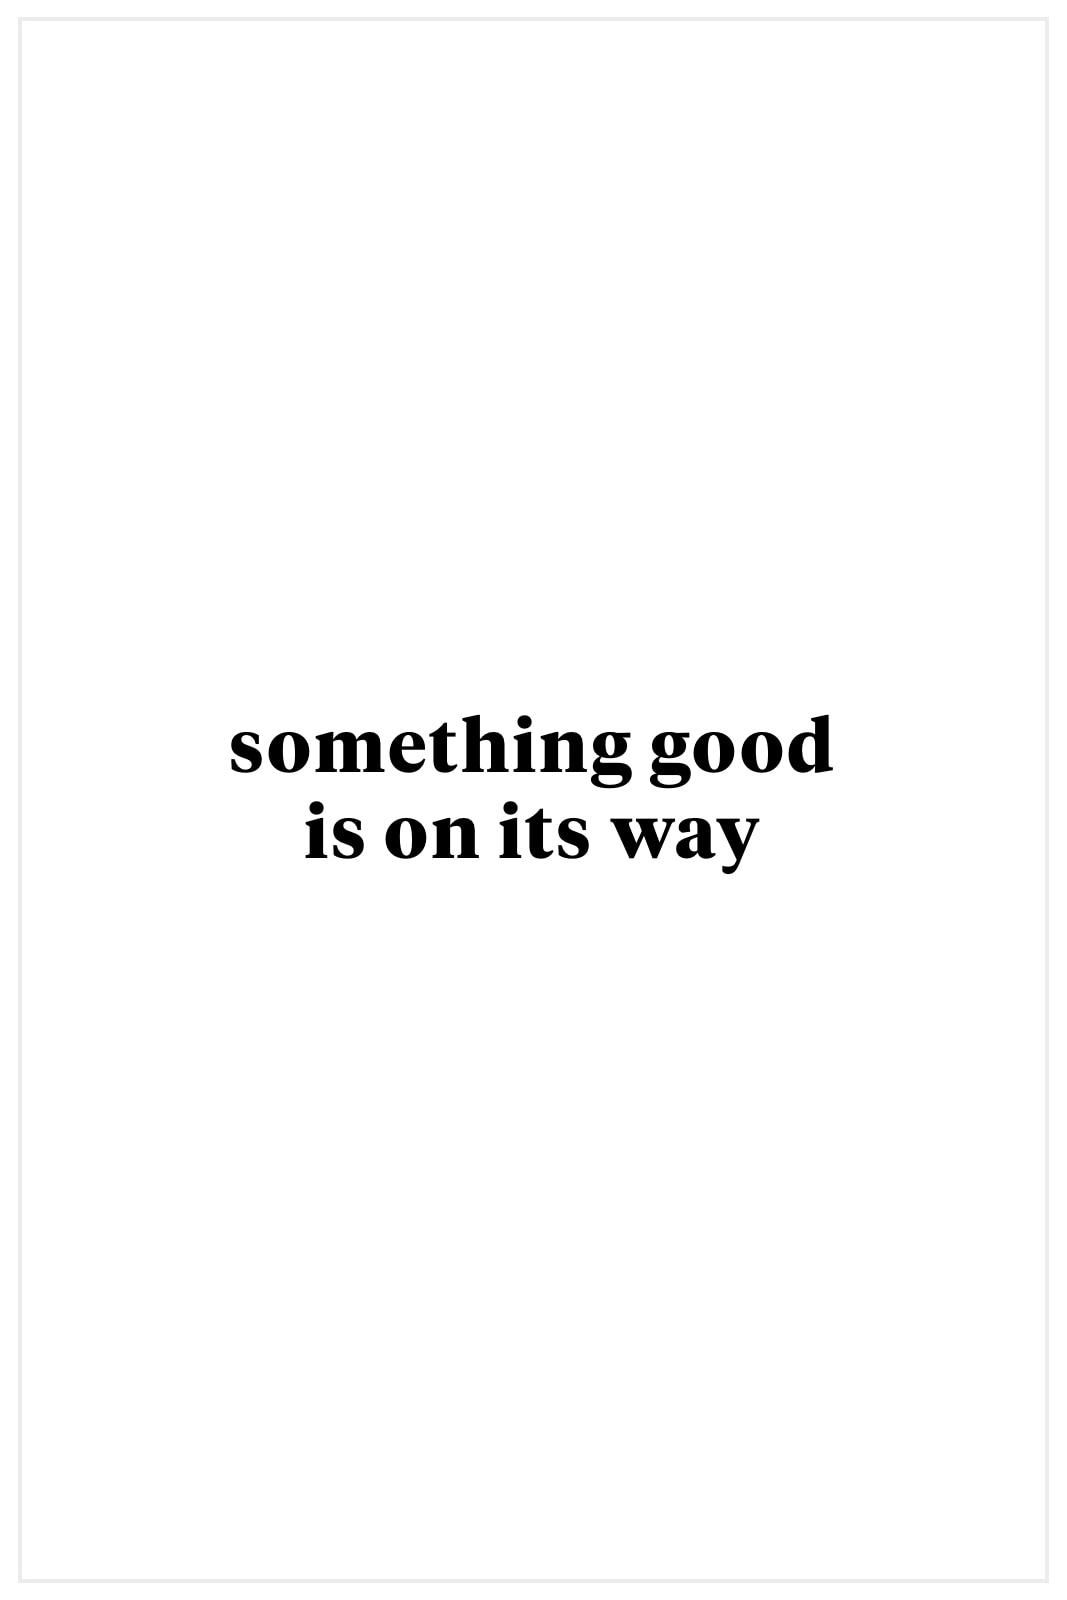 David lerner Go Fight Win Tee